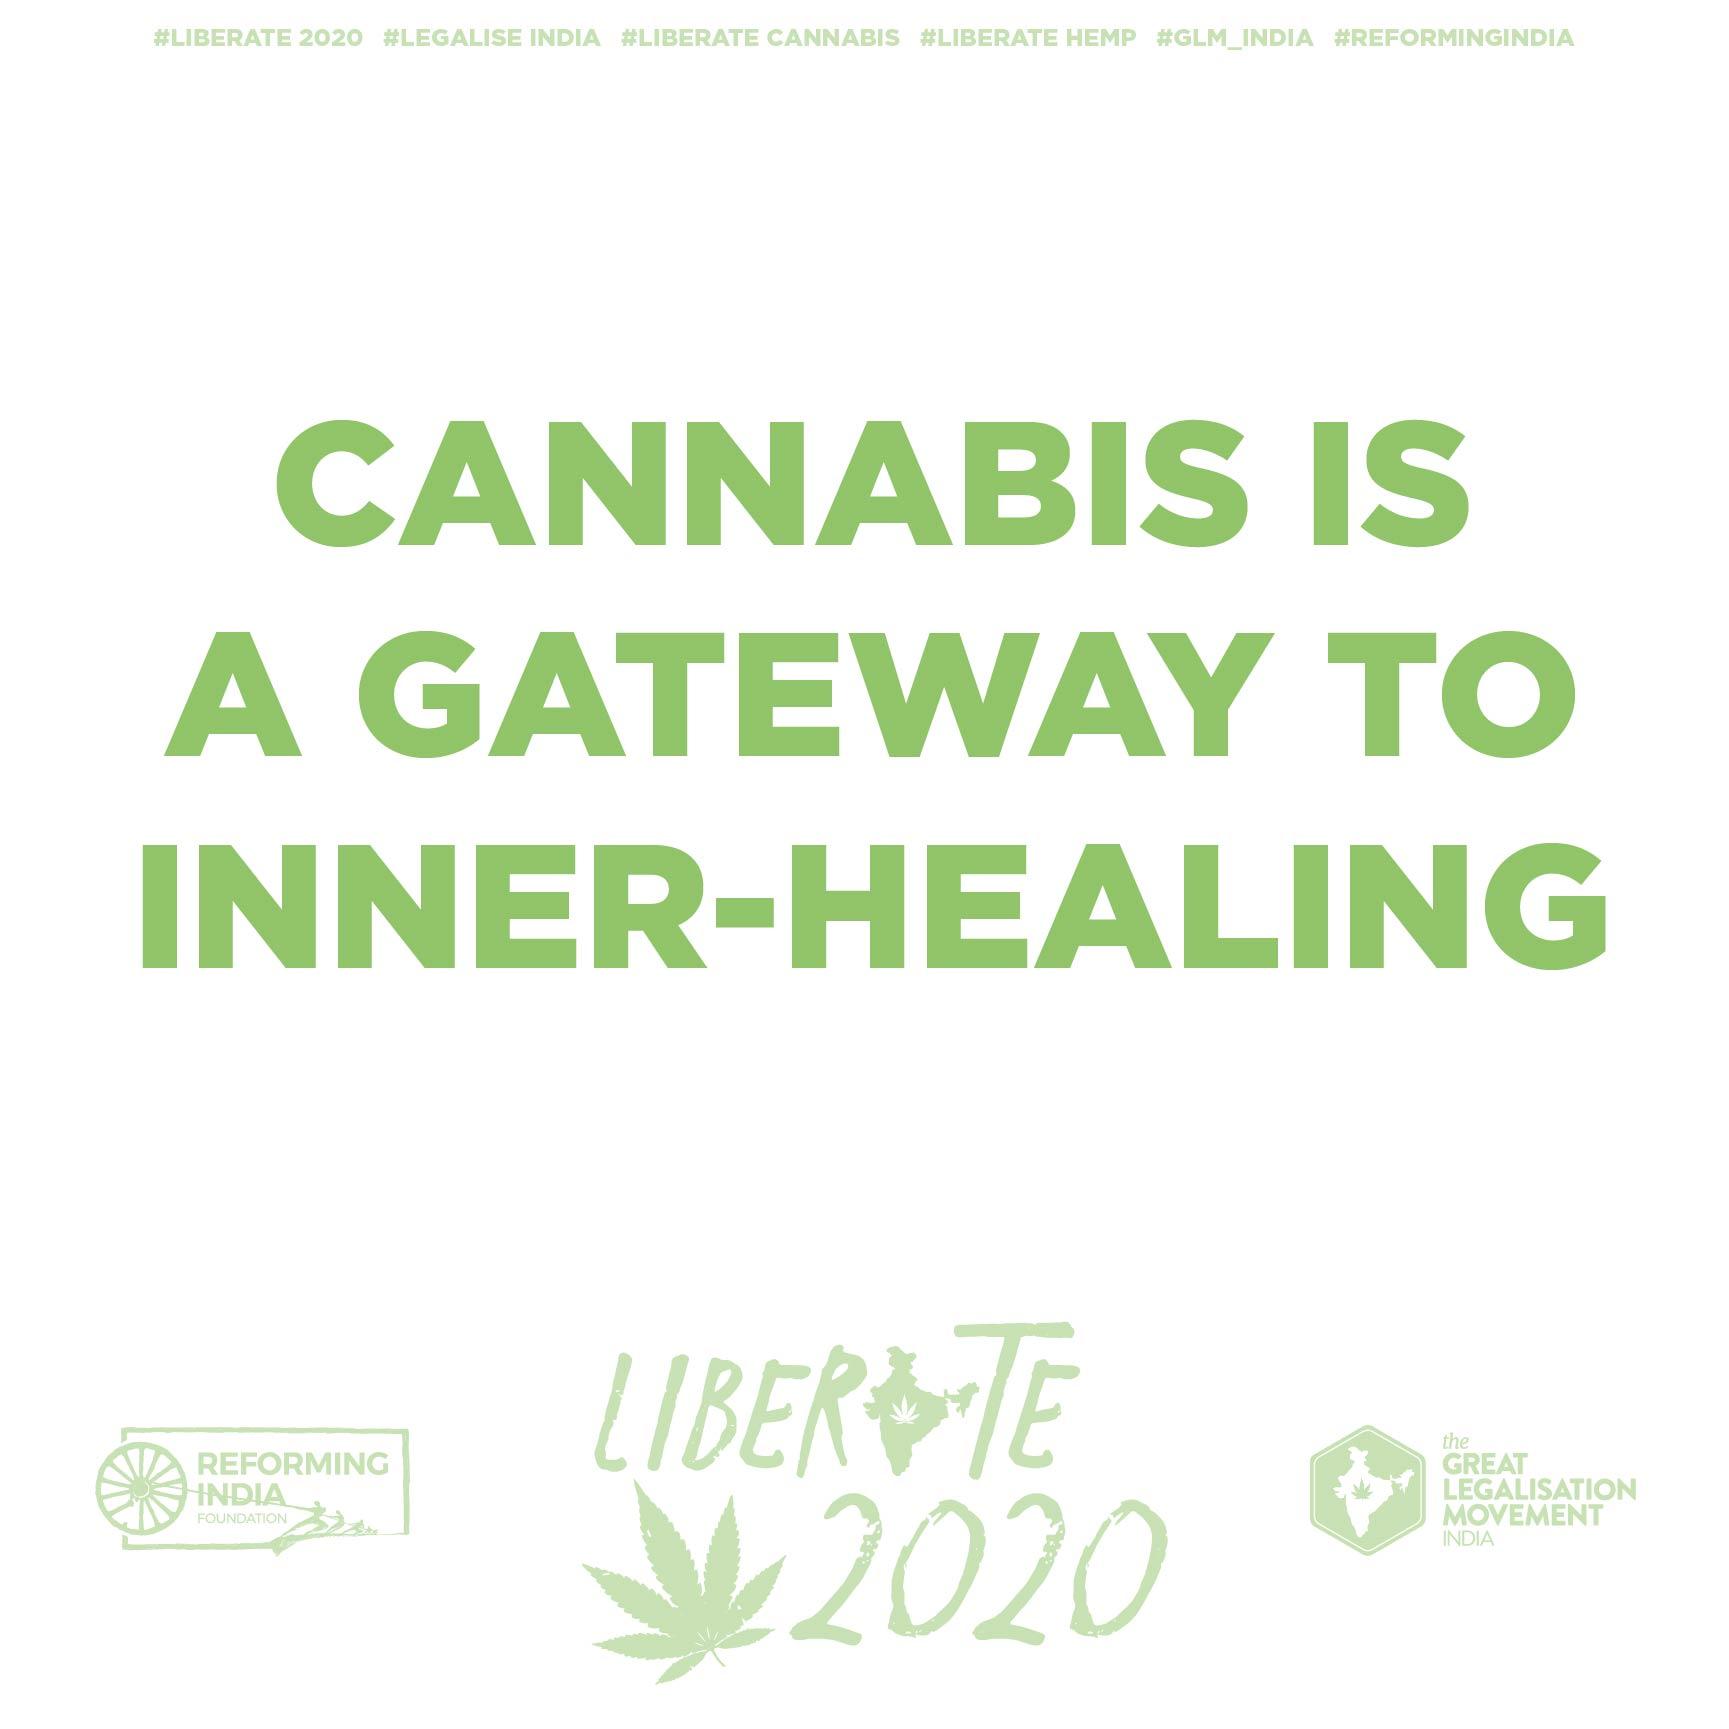 cannabisArtboard 1 copy 17-50.jpg